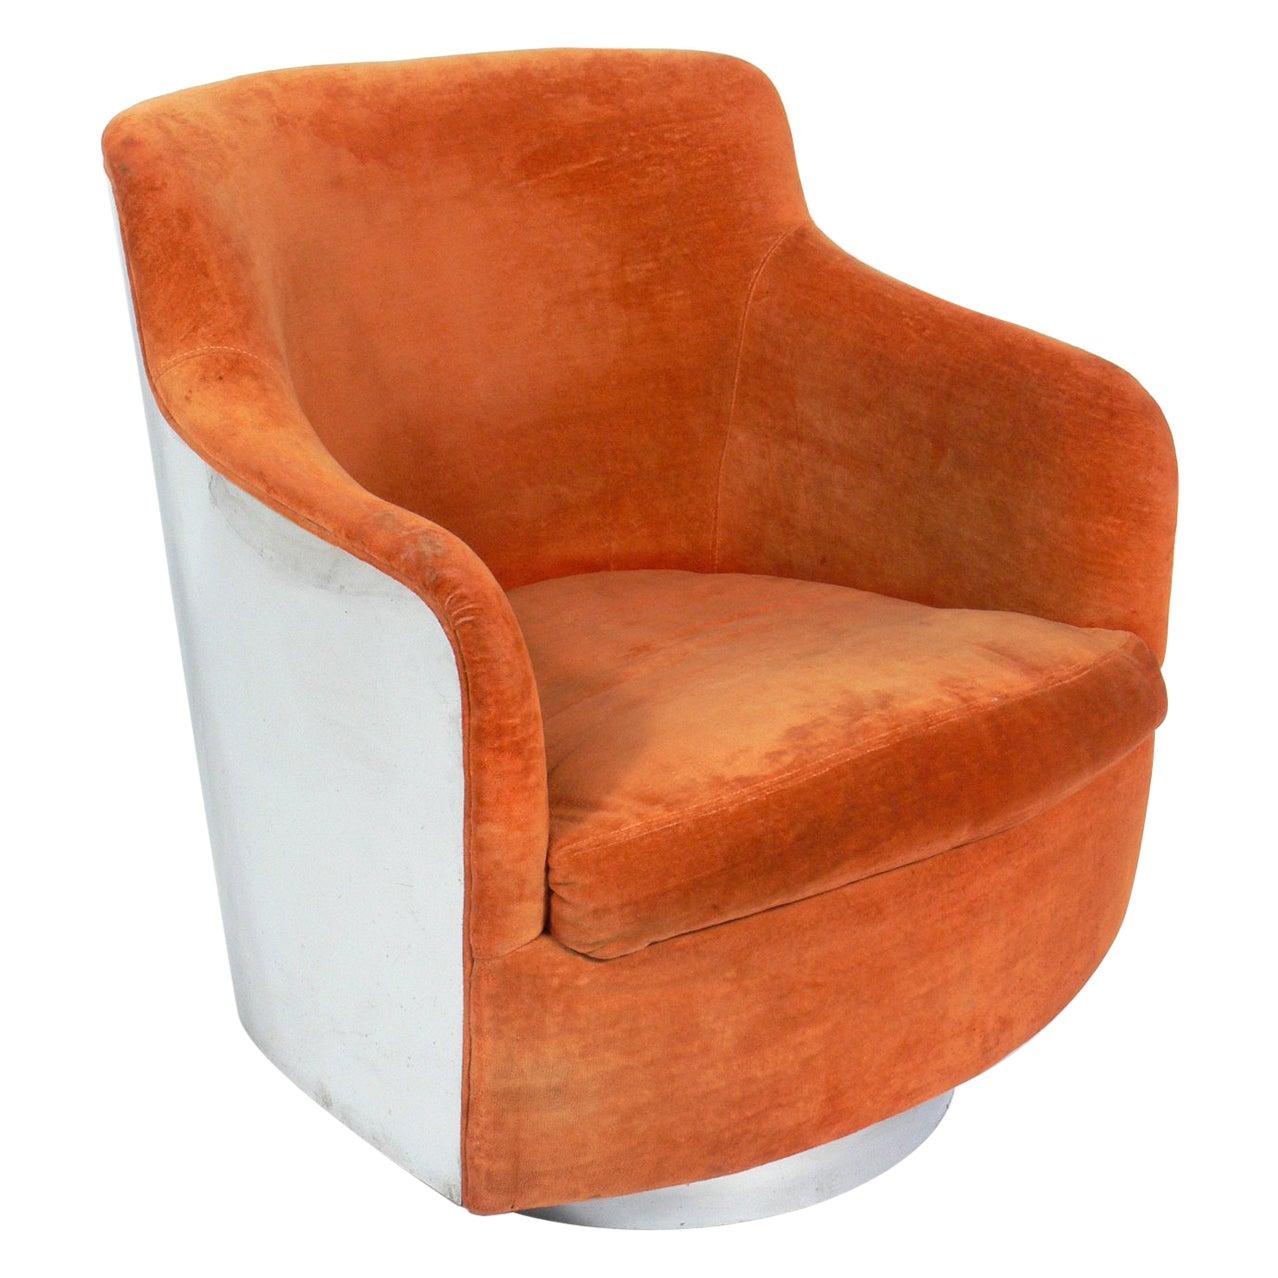 Milo Baughman Chrome Swivel Chair